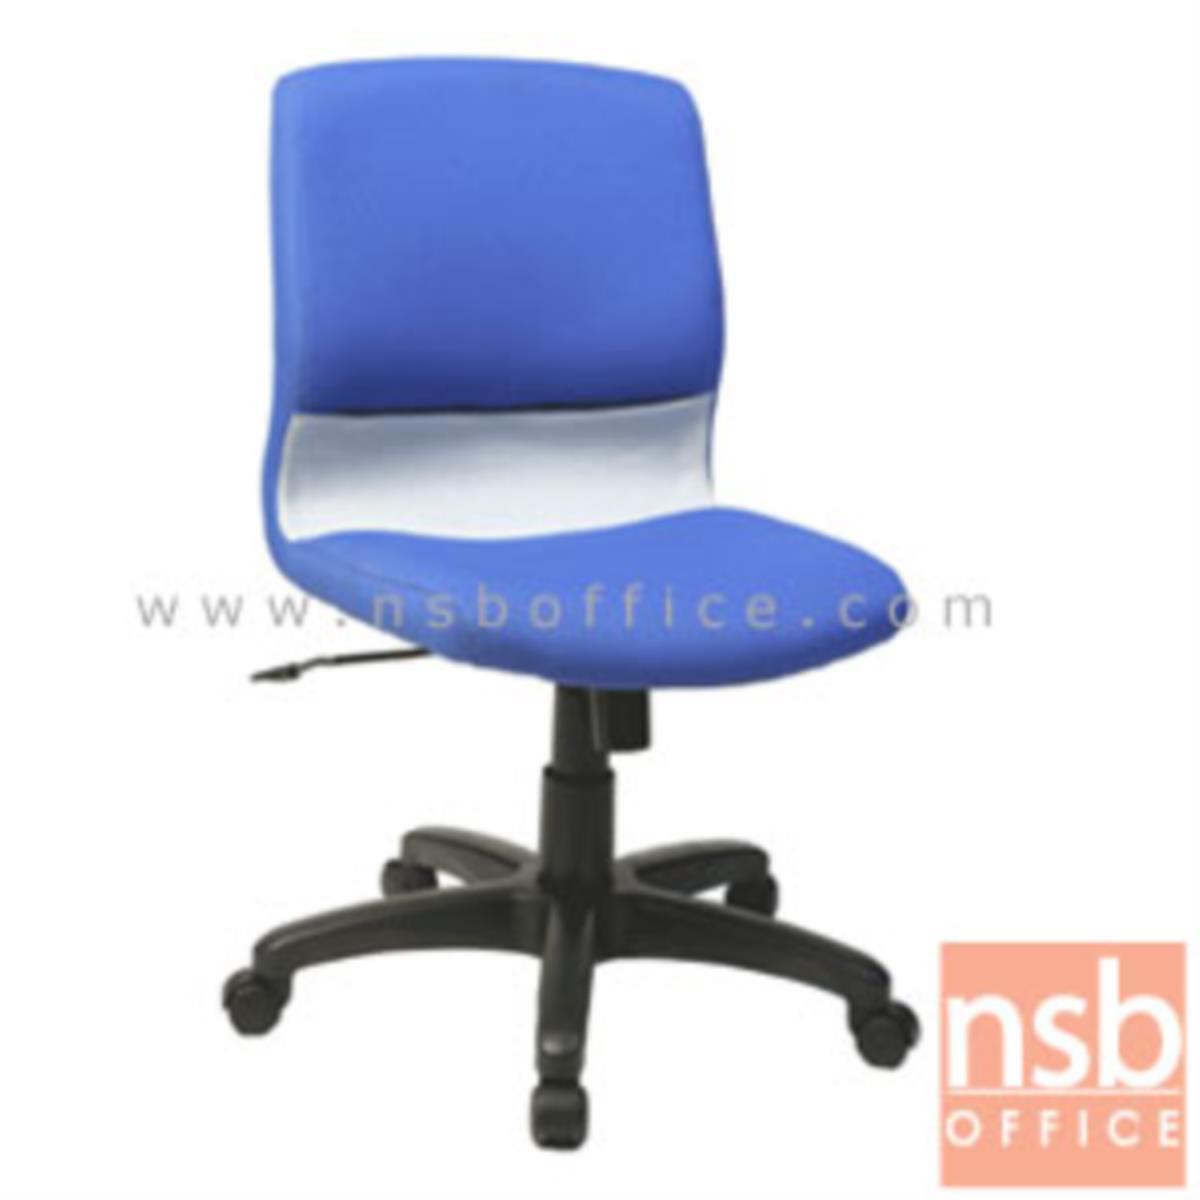 B03A355:เก้าอี้สำนักงาน รุ่น Frou (โฟ)  โช๊คแก๊ส มีก้อนโยก ขาพลาสติก